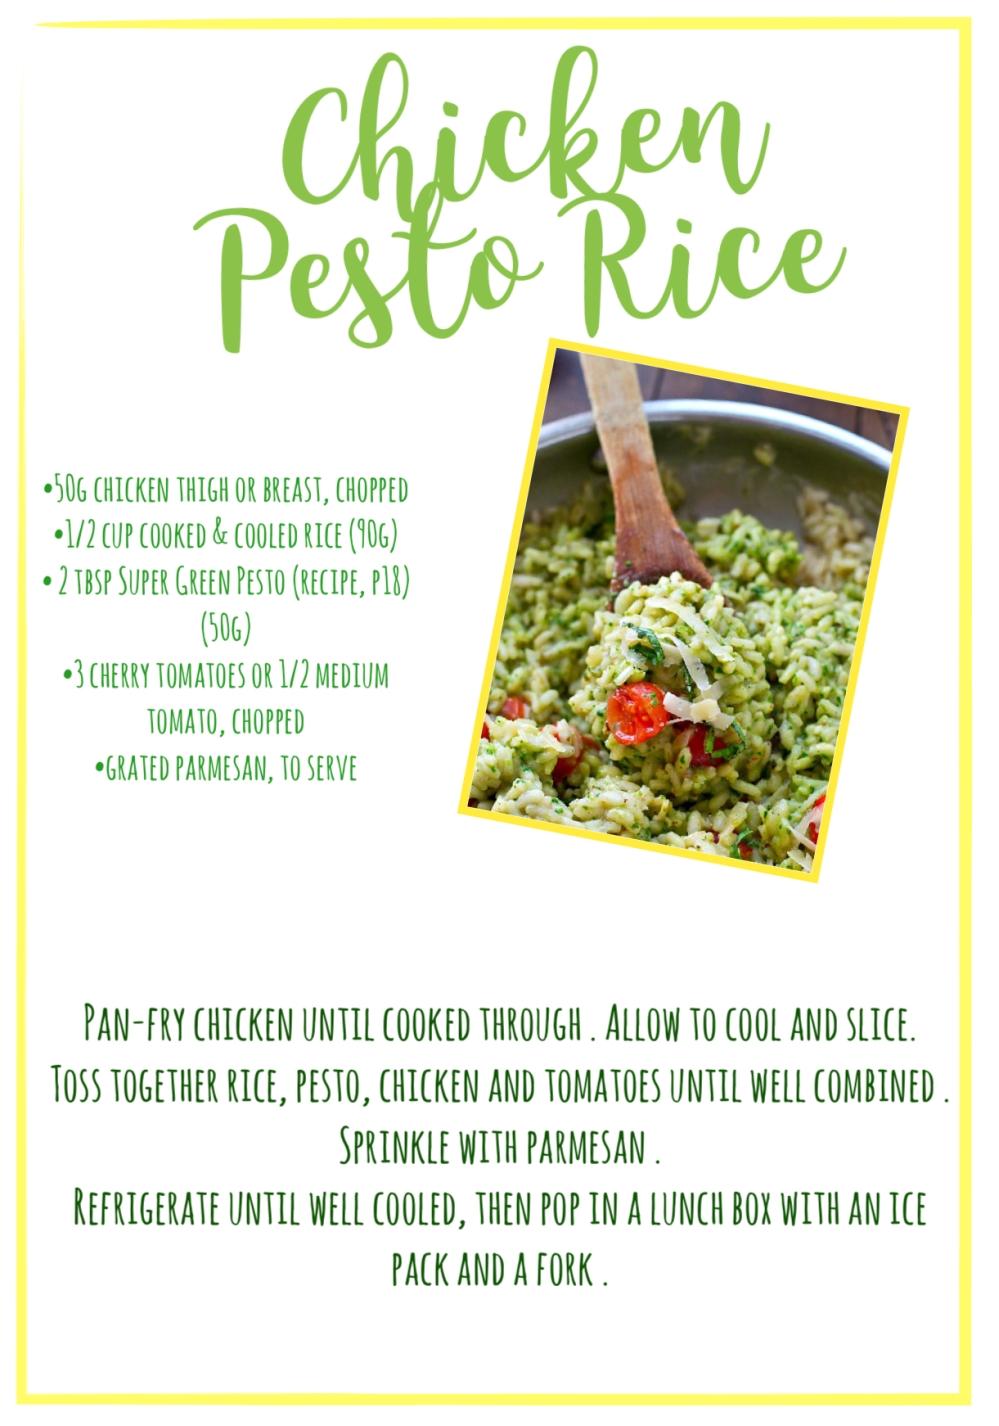 Chicken pesto rice